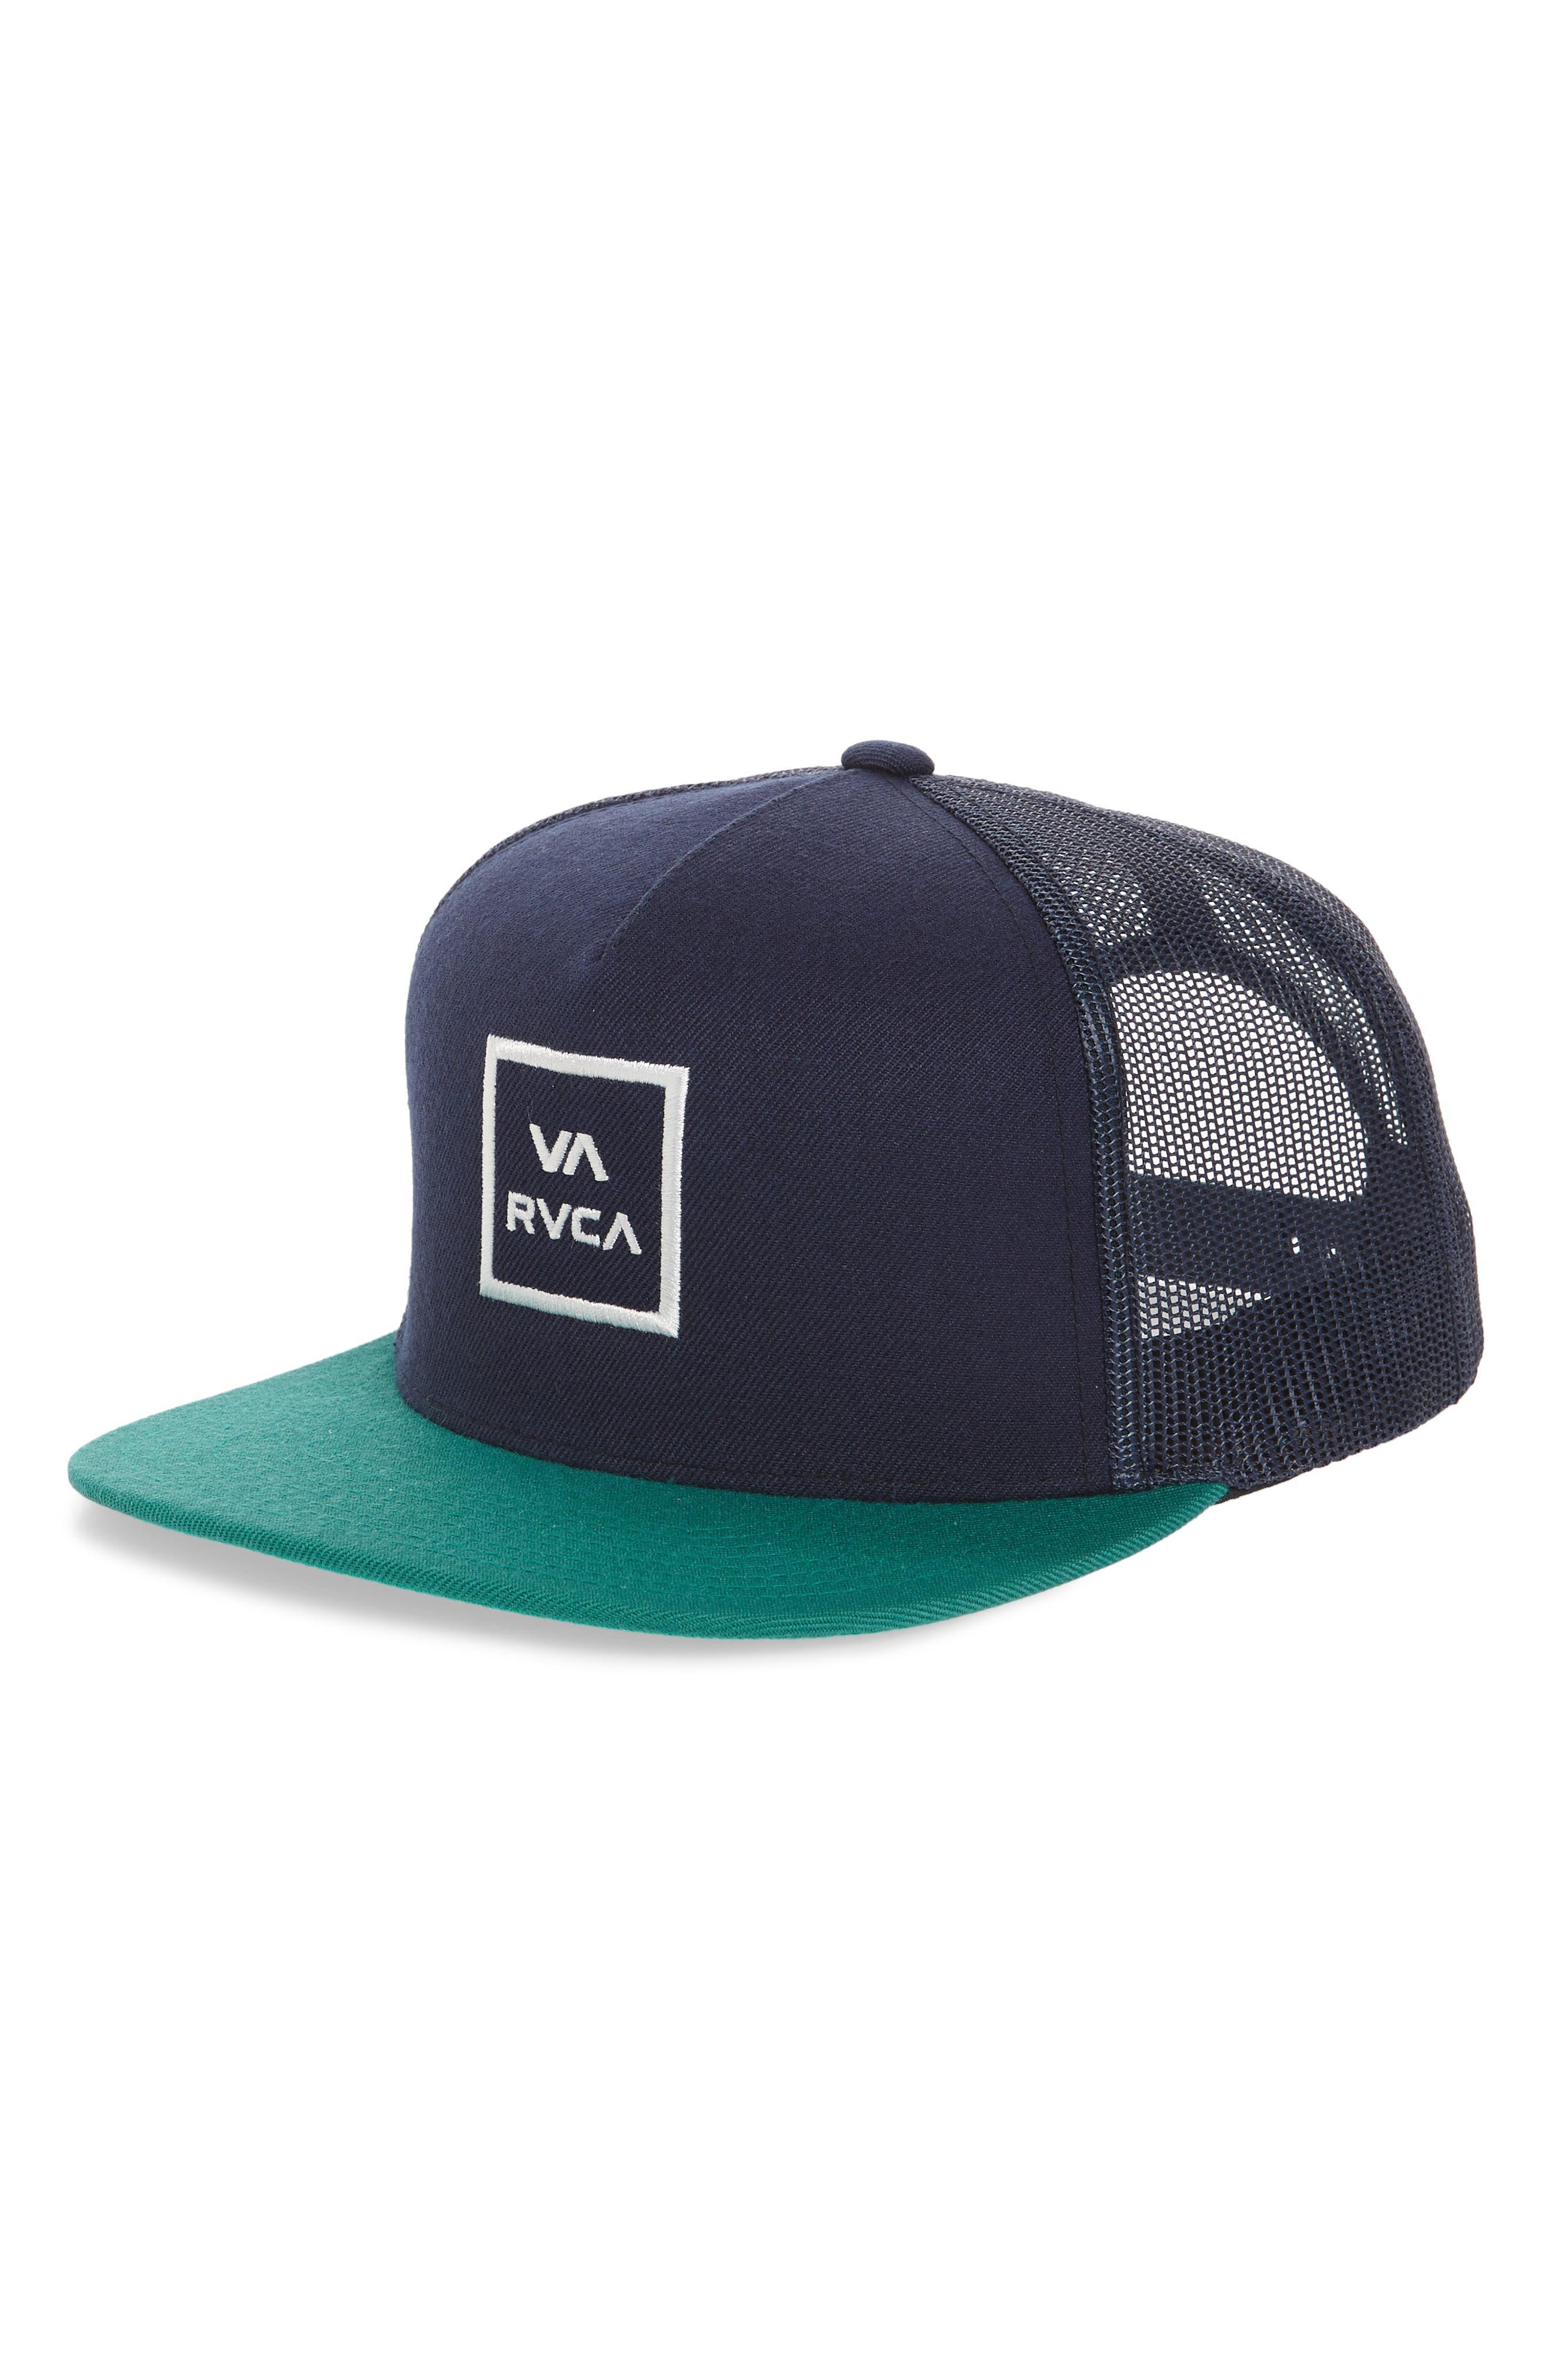 VA All the Way Trucker Hat,                             Main thumbnail 1, color,                             Navy/ Teal